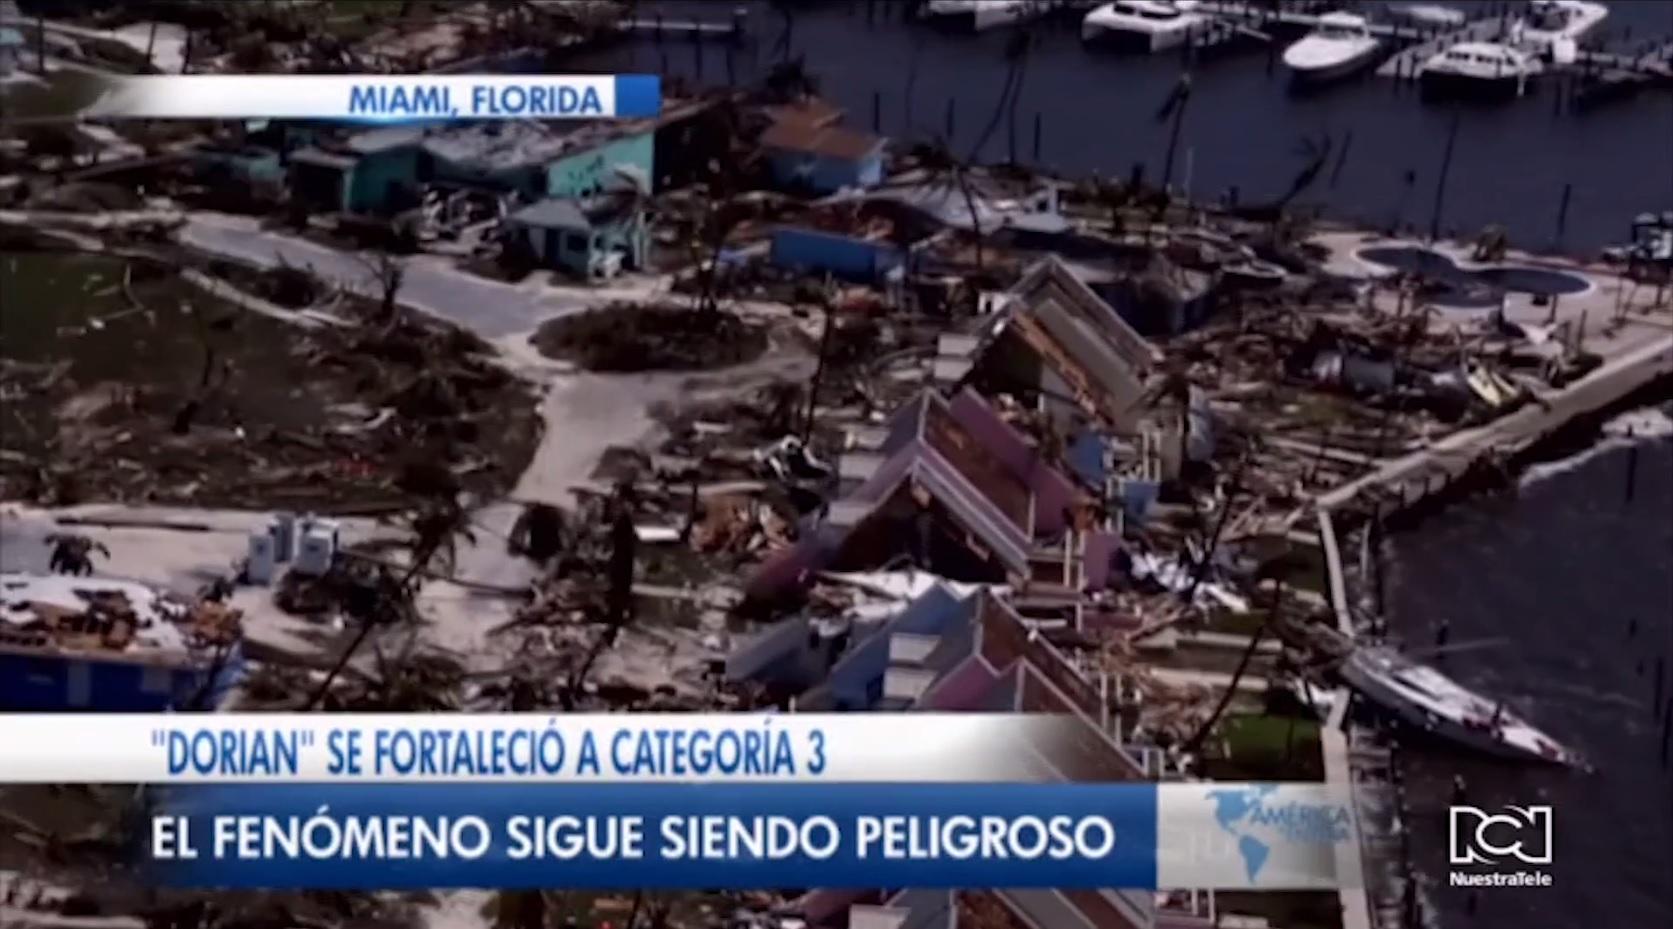 Dorian avanza como huracán de categoría 3 rumbo a las Carolinas